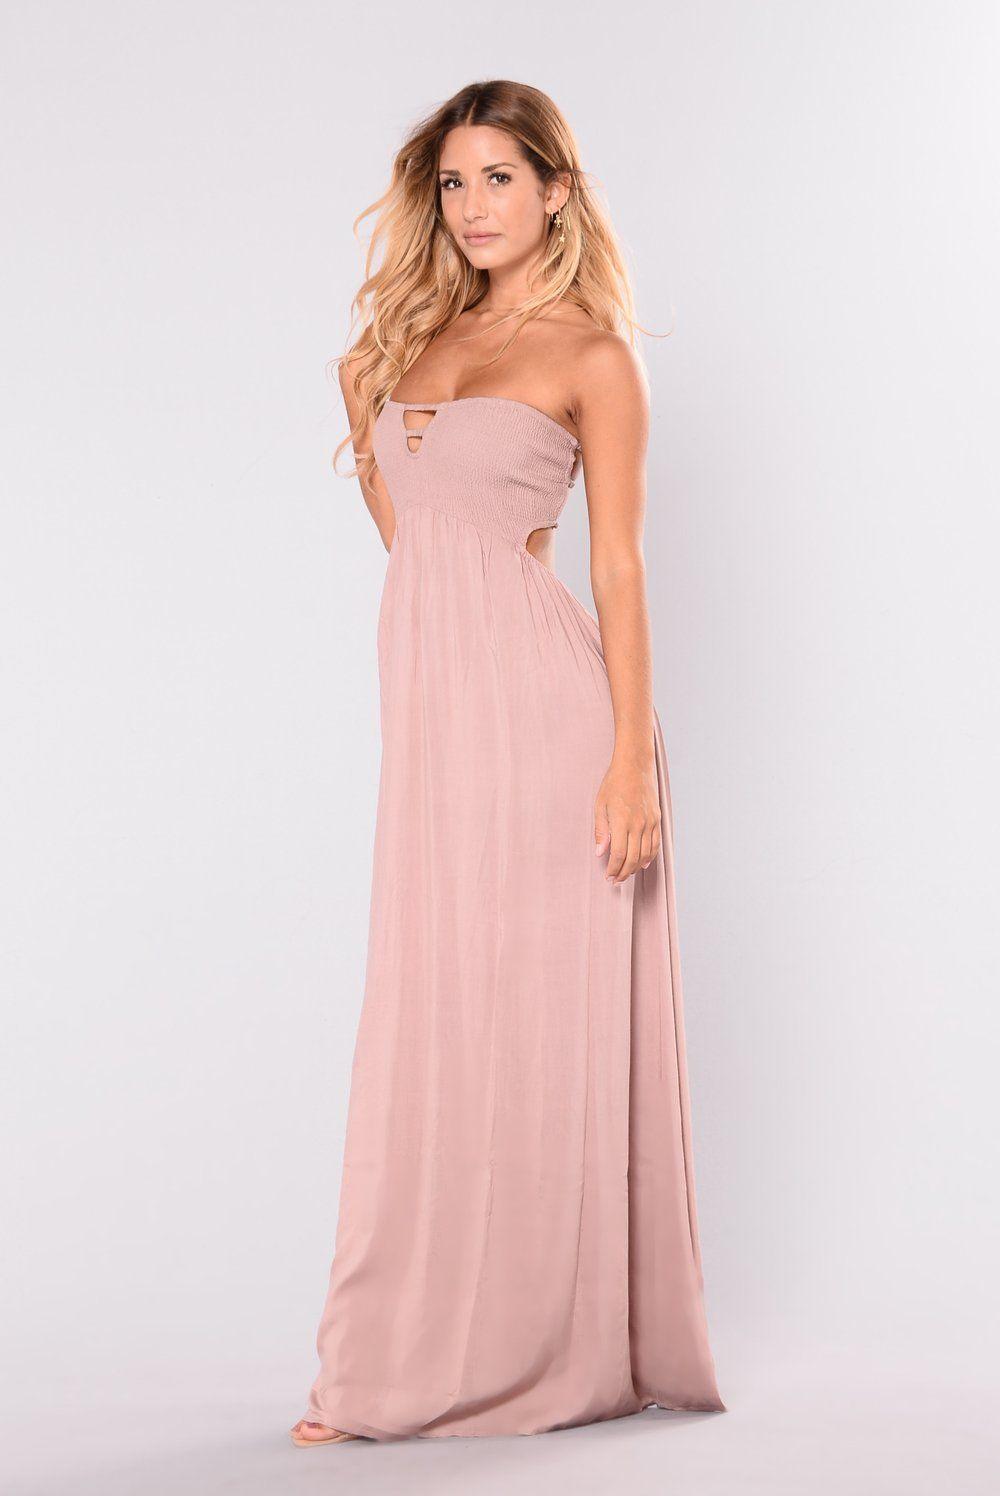 Life\'s A Beach Maxi Dress - Blush | Sexy things | Pinterest ...